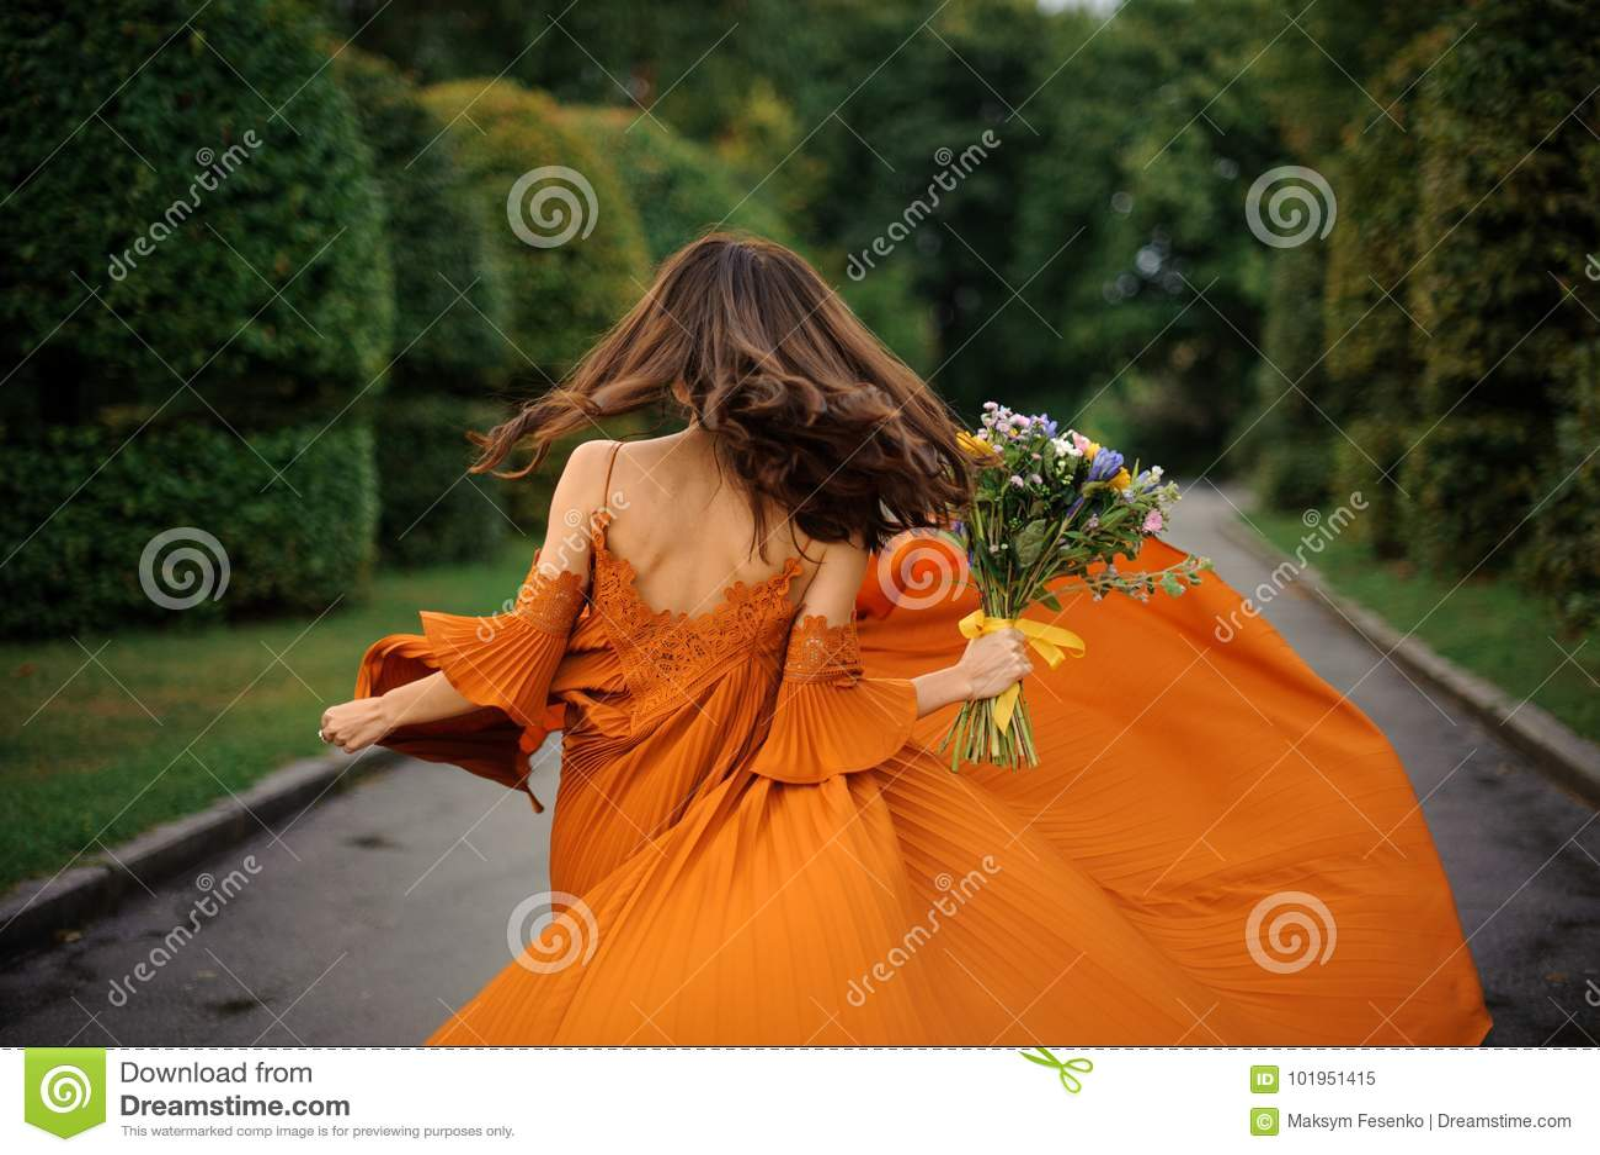 Back view of beautiful woman in long orange dress